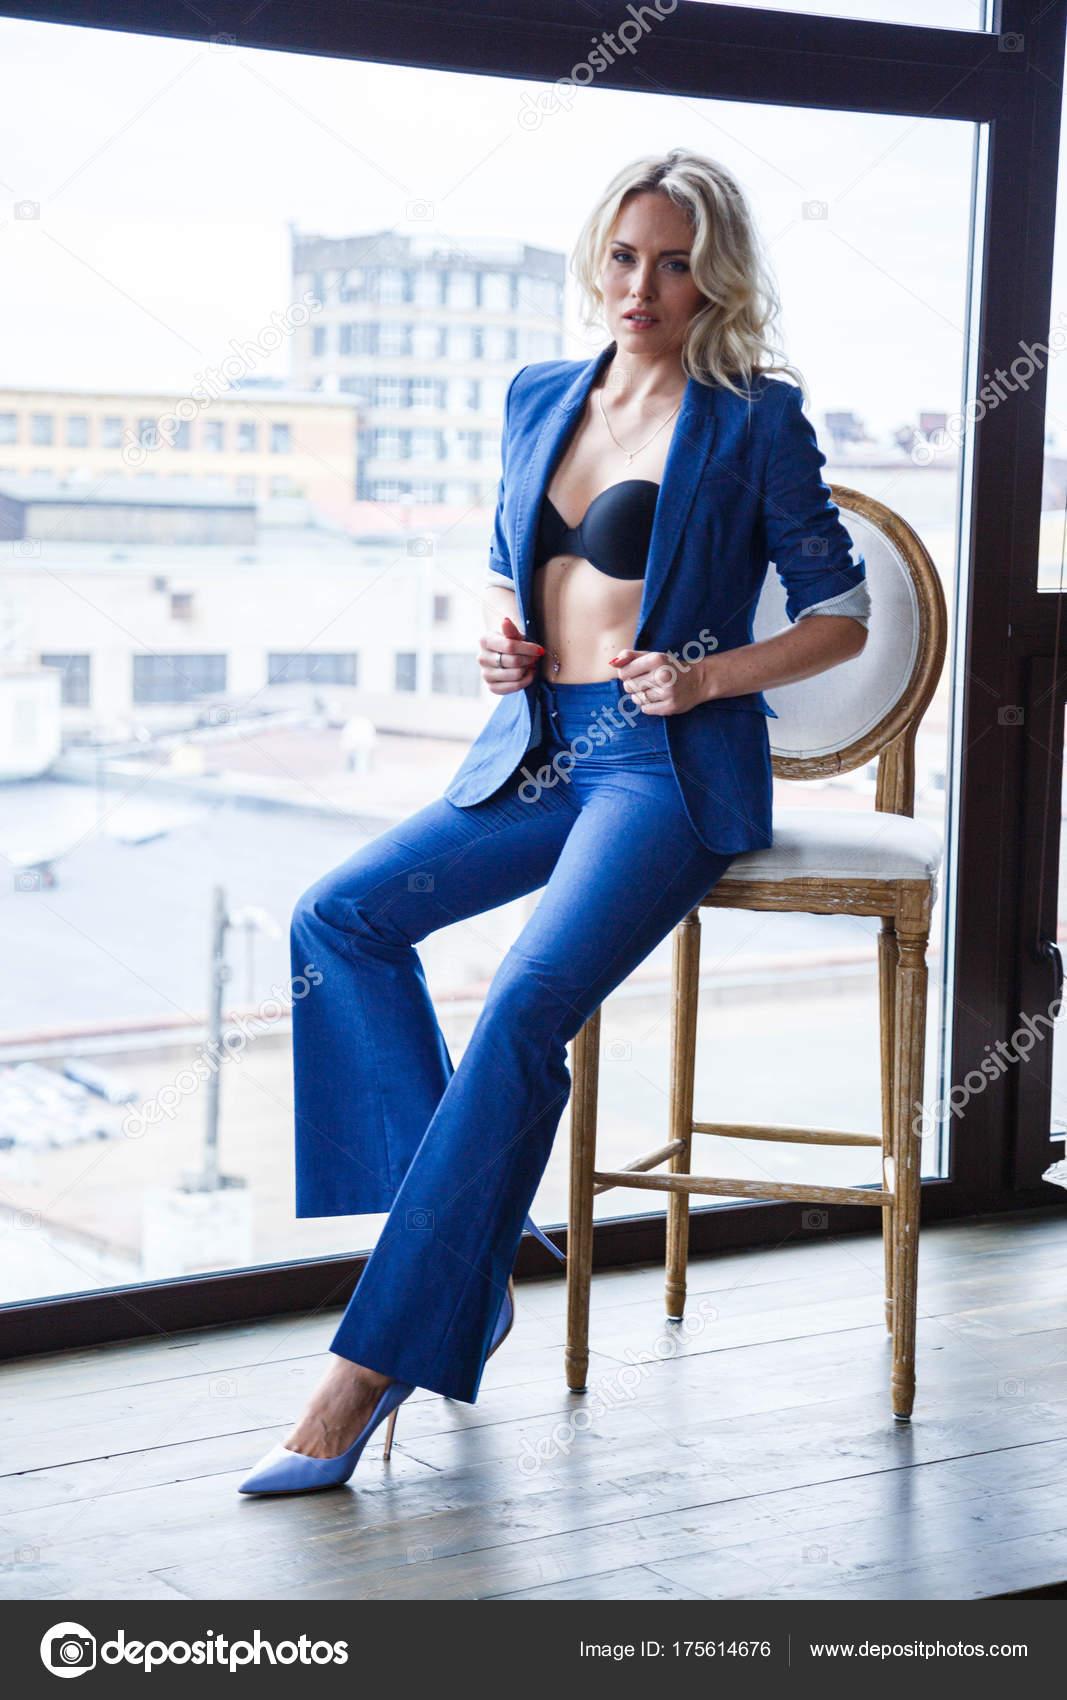 9c5dc083b29 Studio πορτρέτο του όμορφη ξανθιά γυναίκα με σγουρά μαλλιά και κομψό  μακιγιάζ, φοράει το μπλε κοστούμι casual και μπλε παπούτσια σε υψηλούς  λόφους, ...